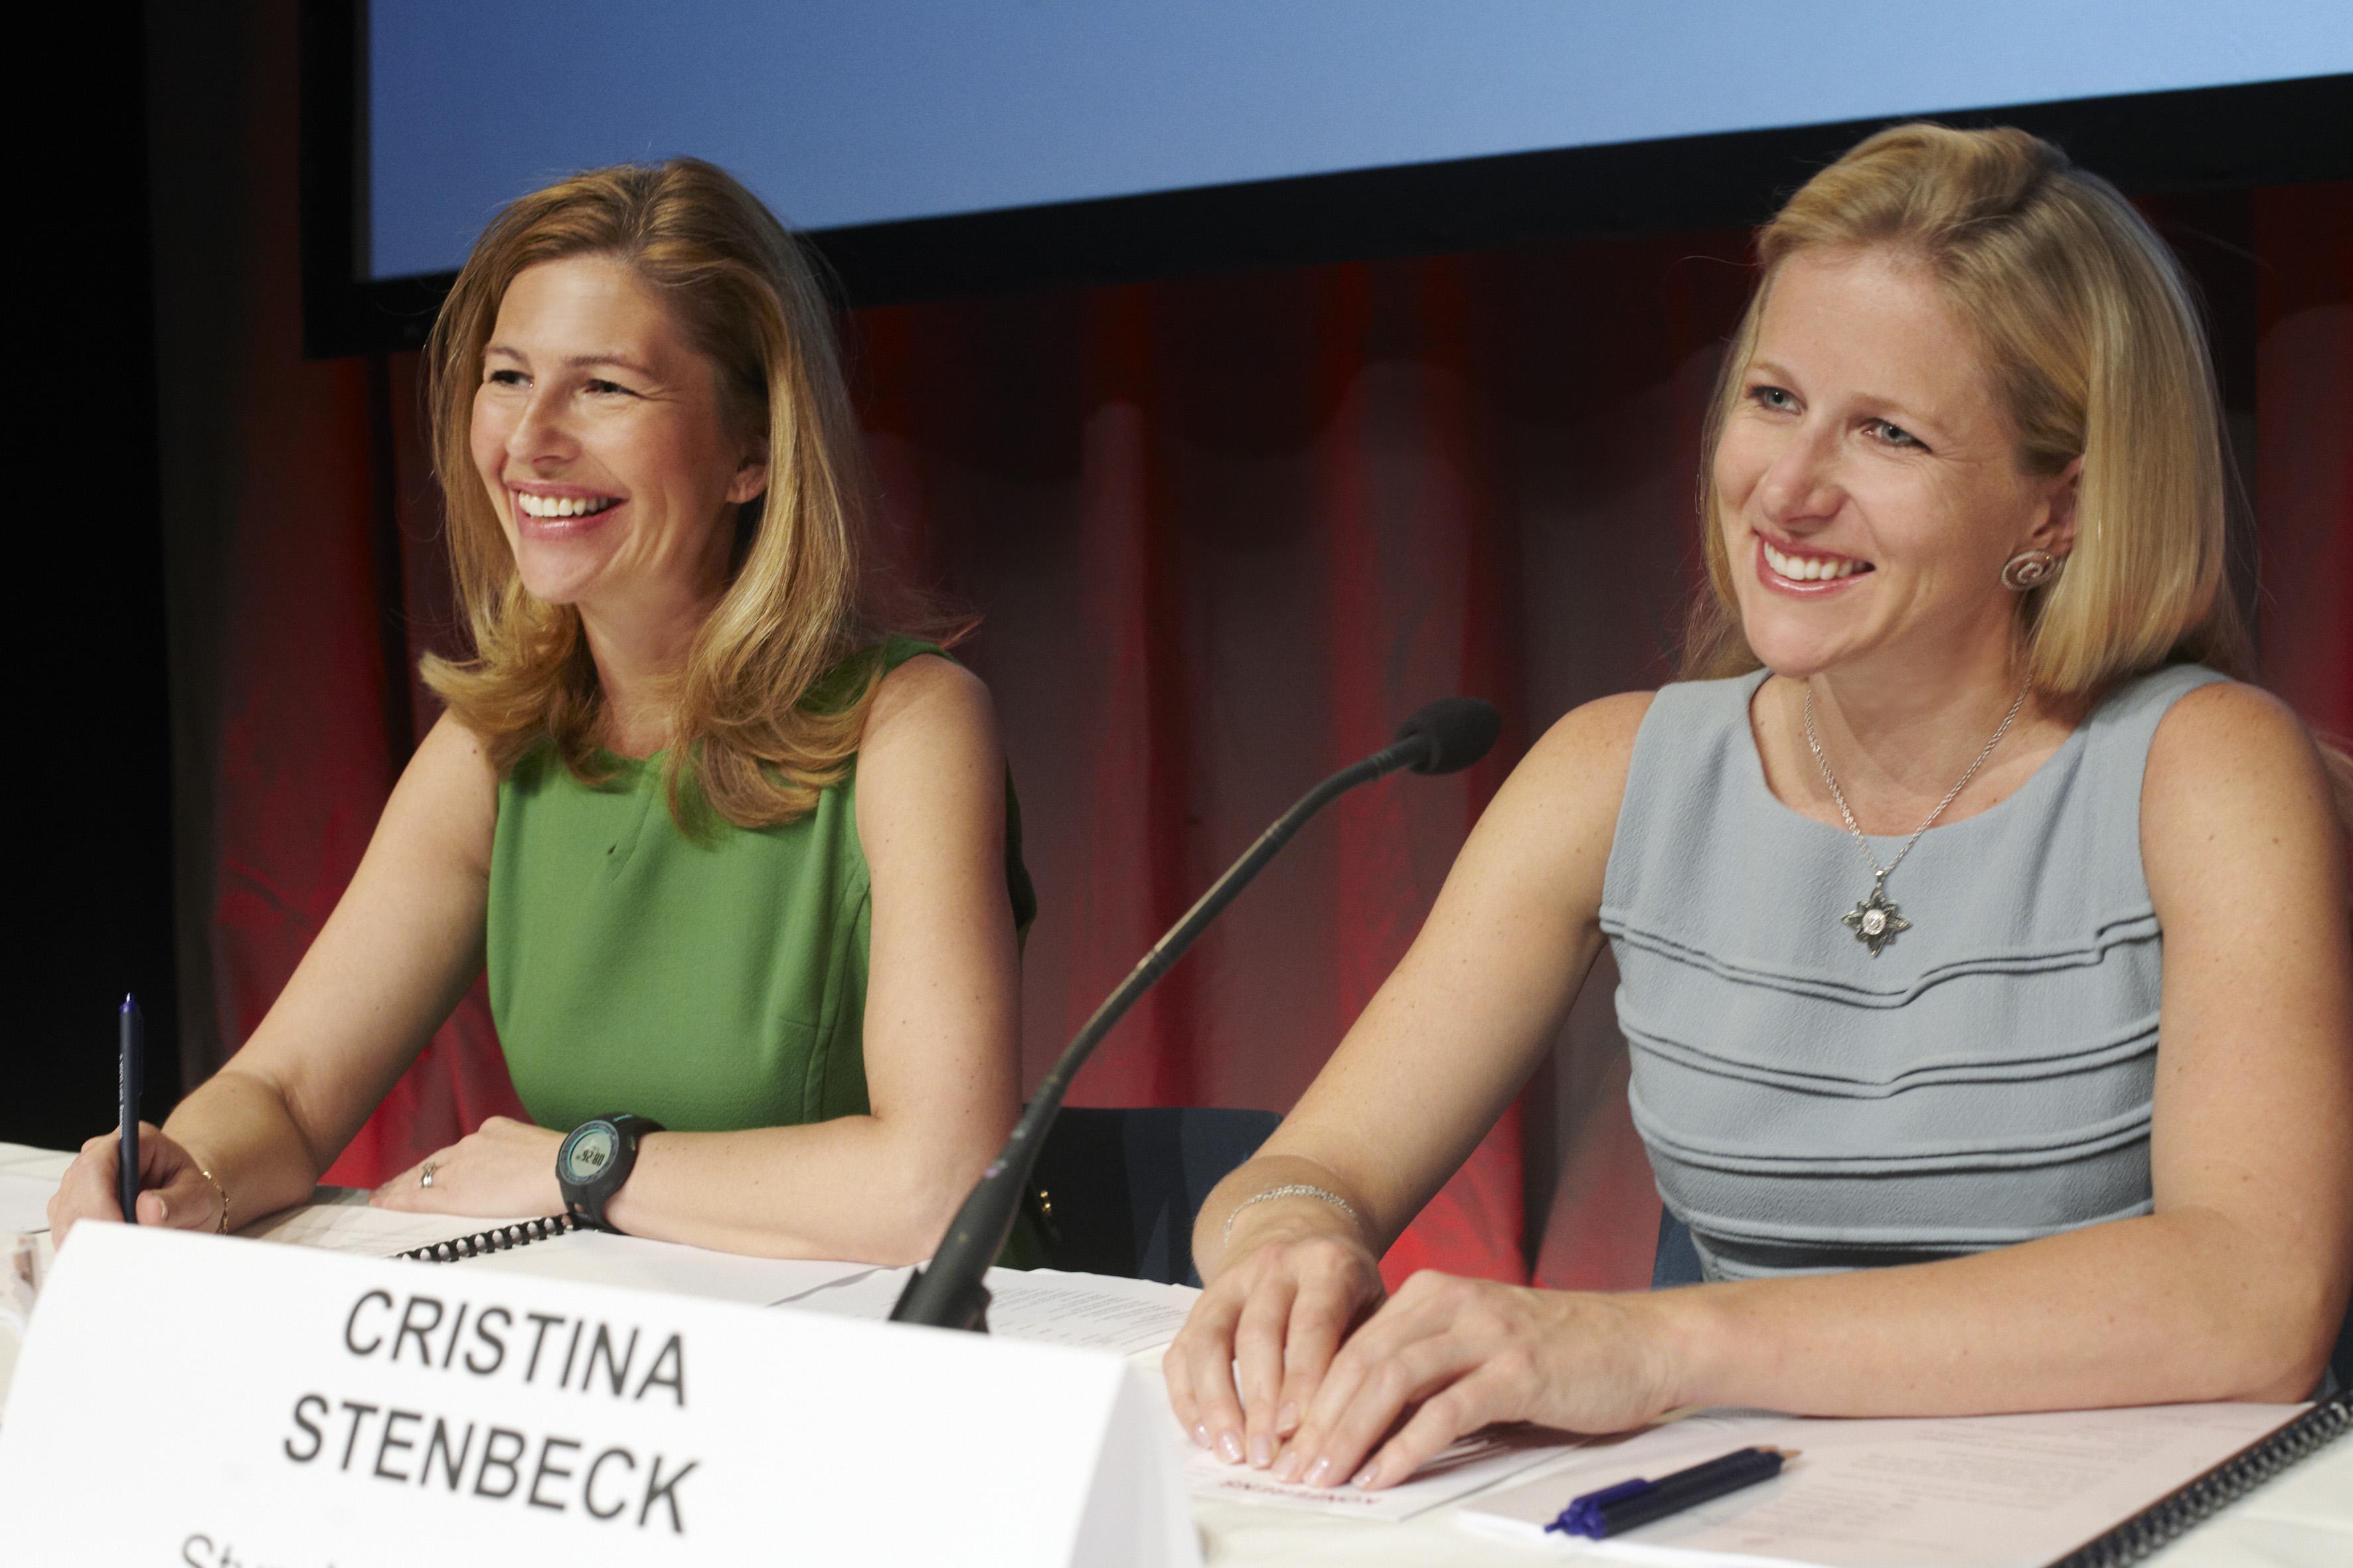 Kinnevik CEO Mia Brunell Livfors & chairman Cristina Stenbeck